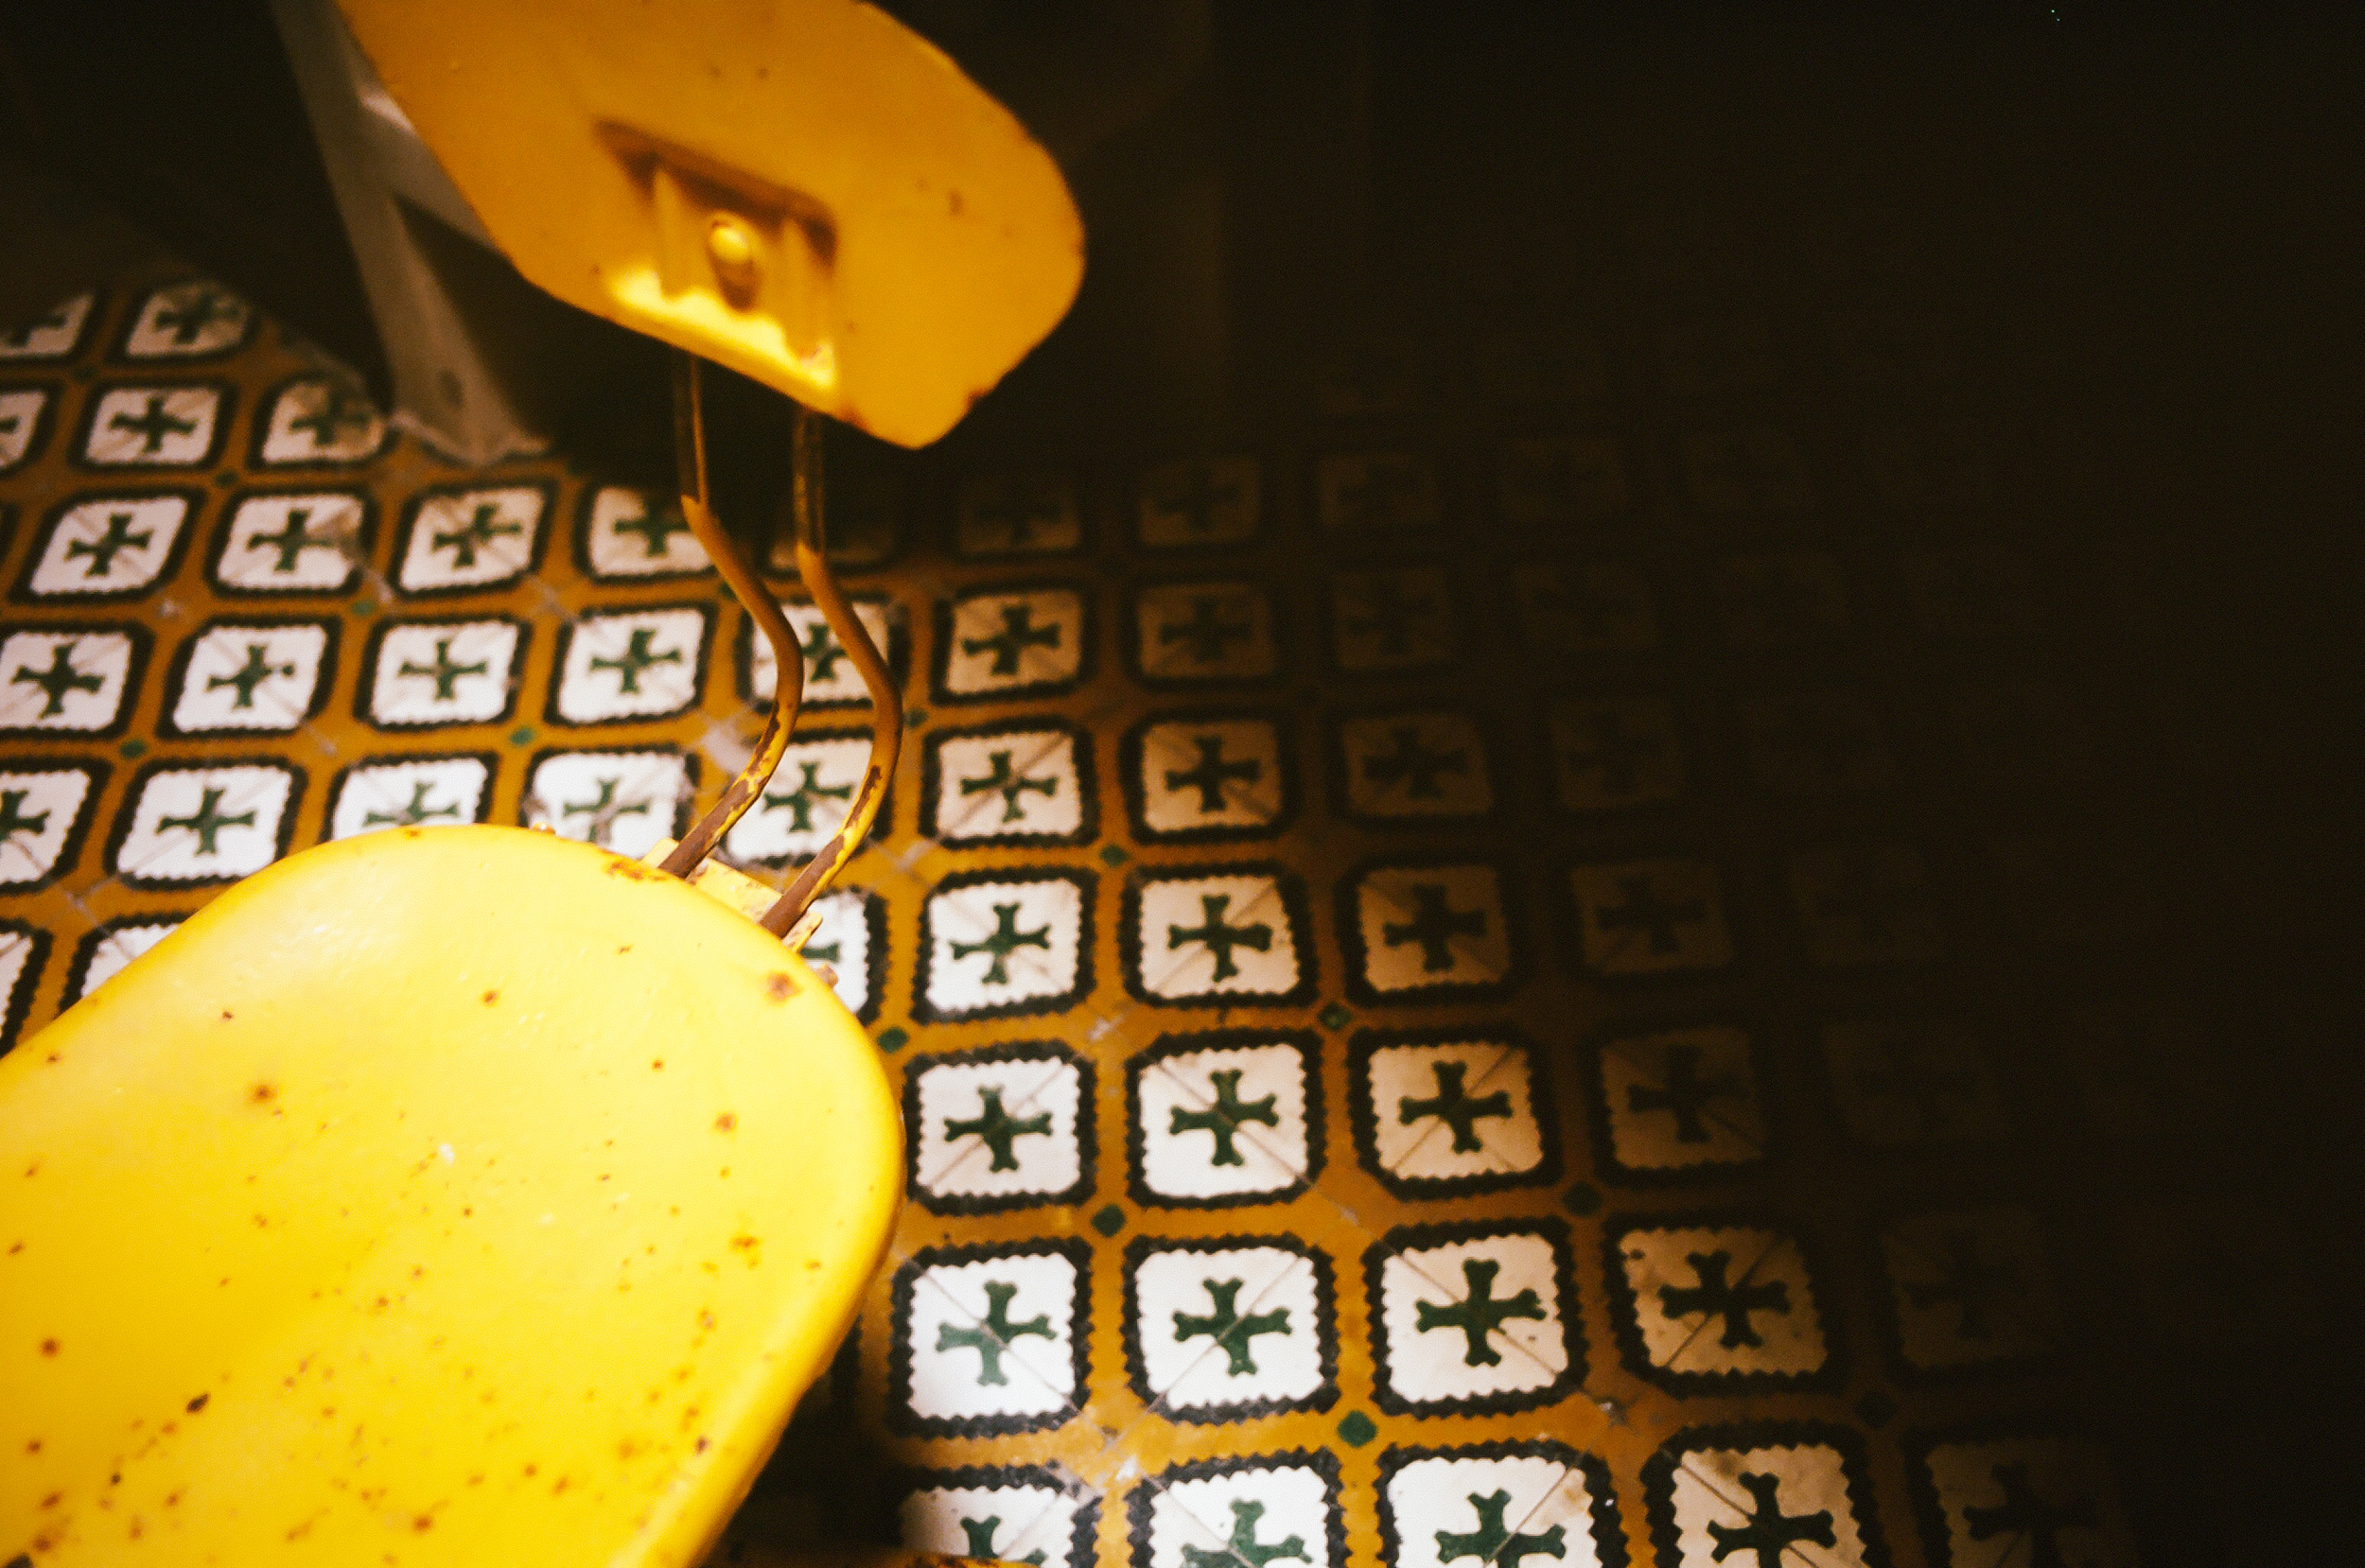 morocco201035mmroll3-11.jpg